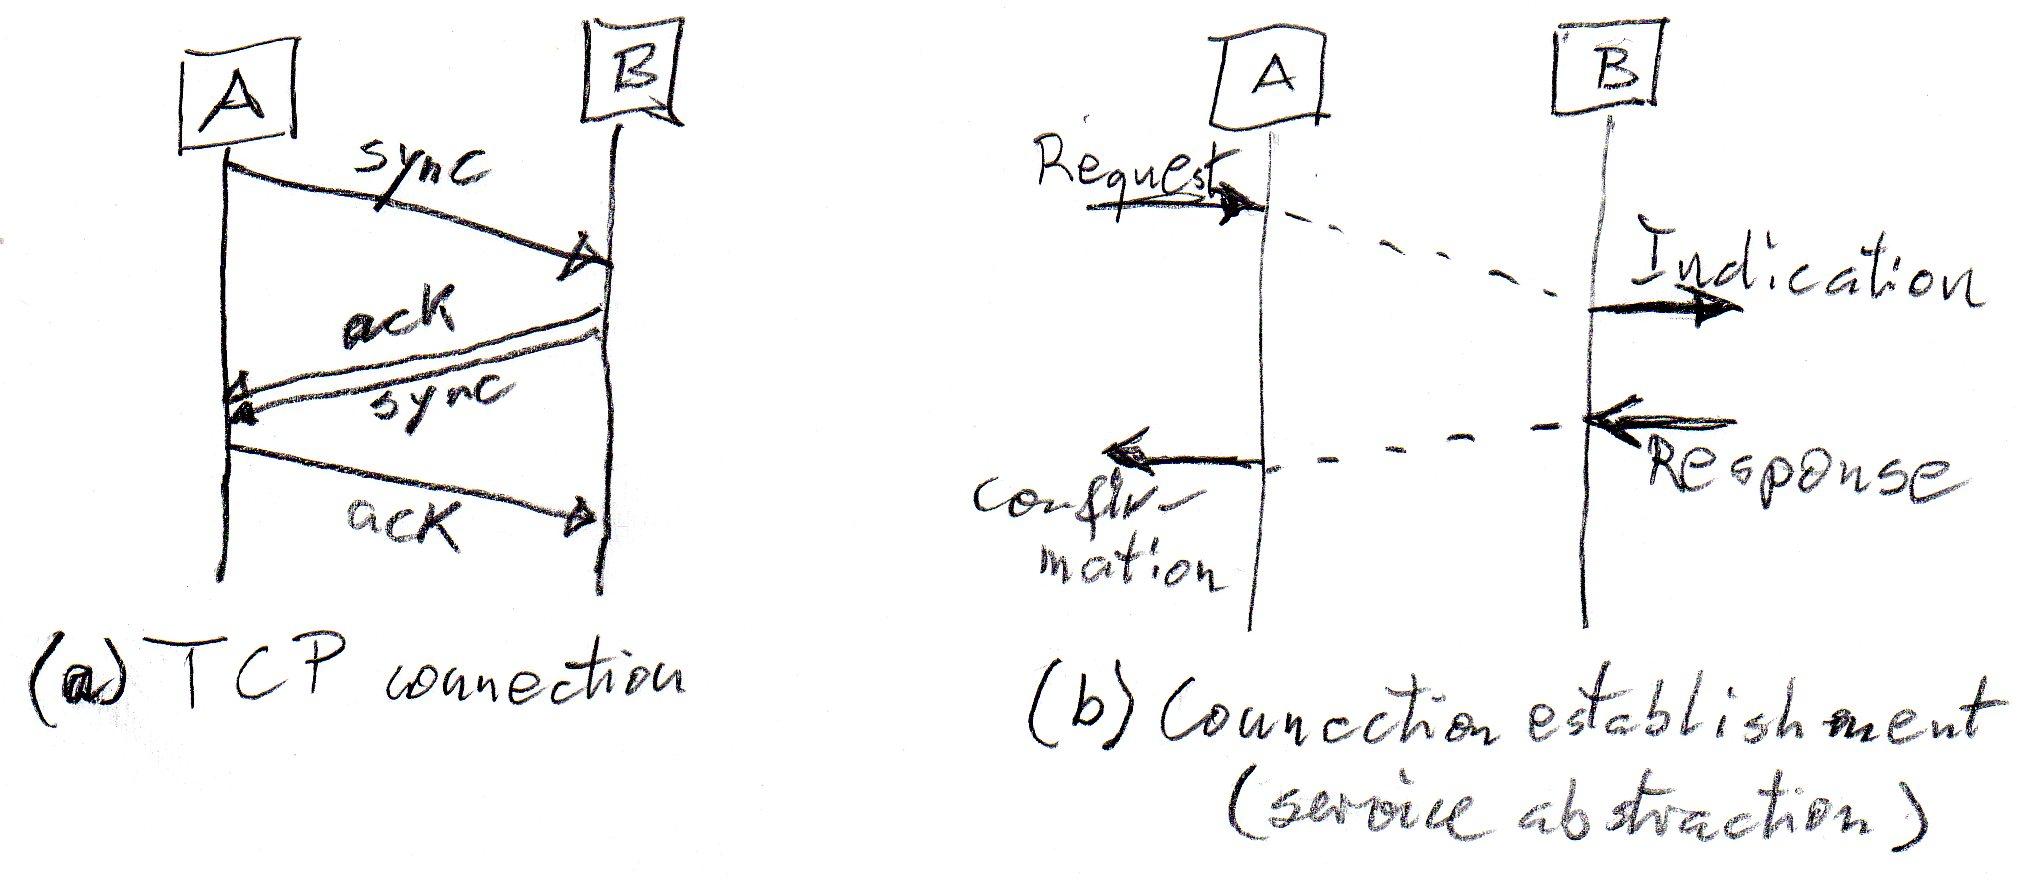 tcp three way handshake diagram spst switch wiring untitled document site uottawa ca